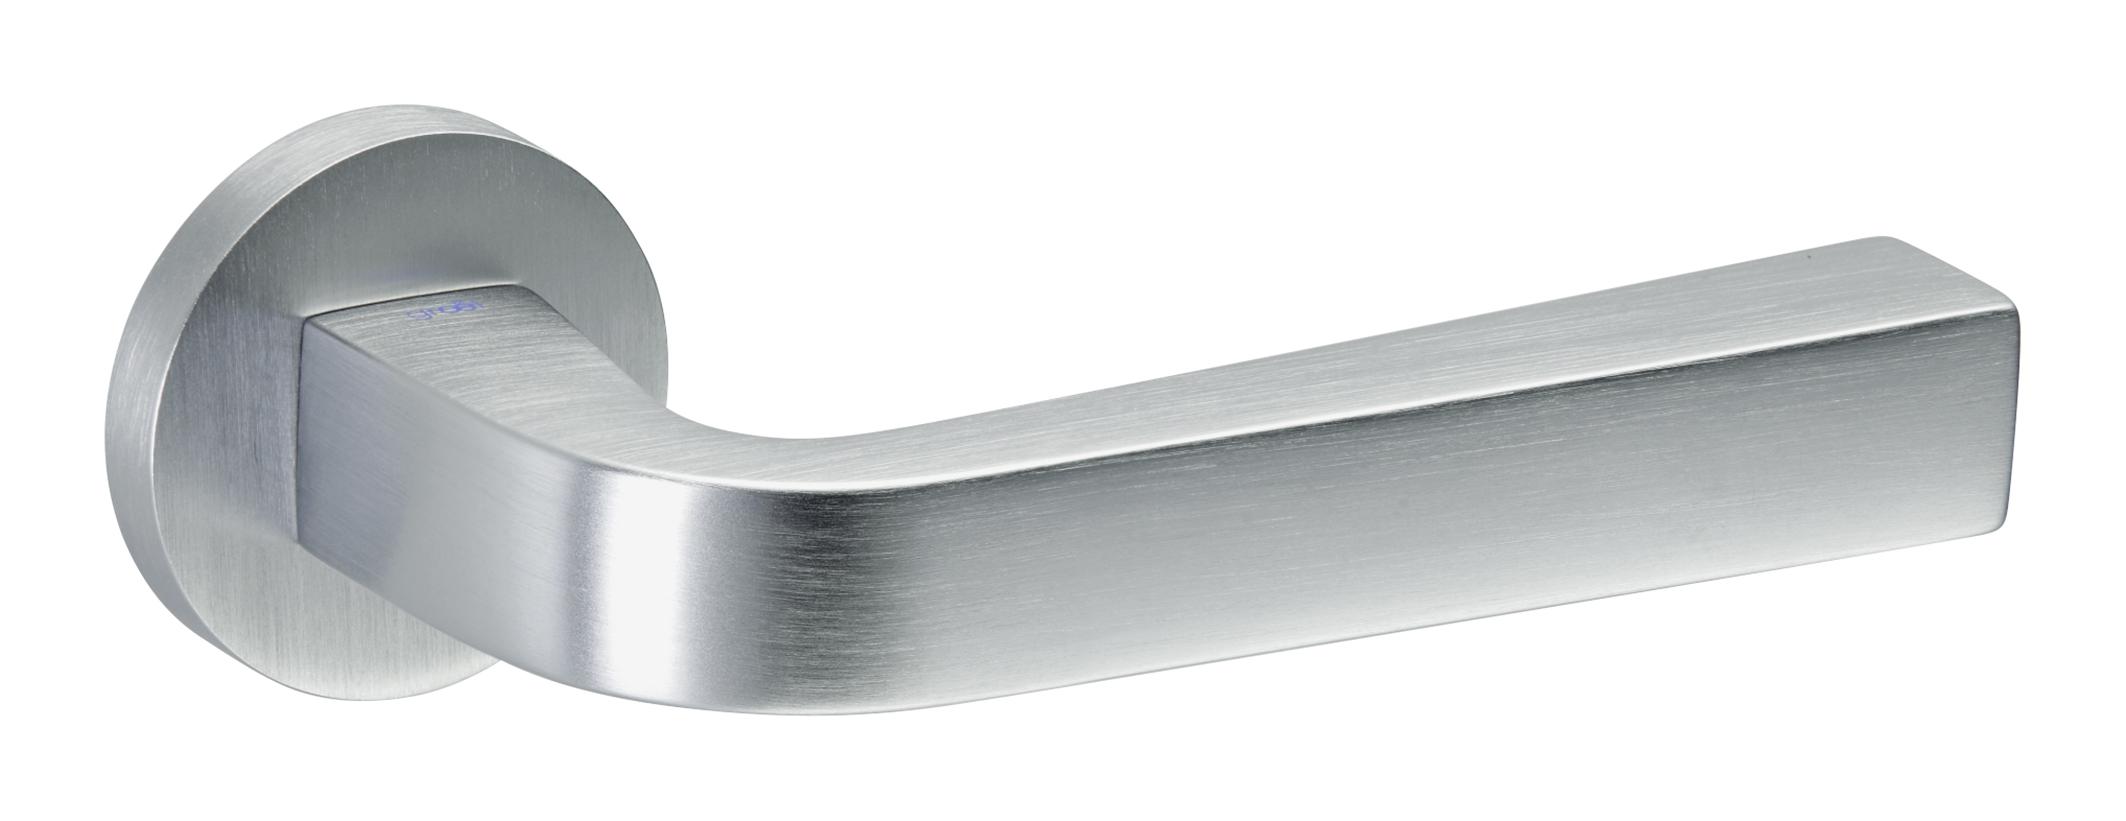 Juego de manillas redonda cromo mate touch 134 manistil - Manivelas puertas interior ...